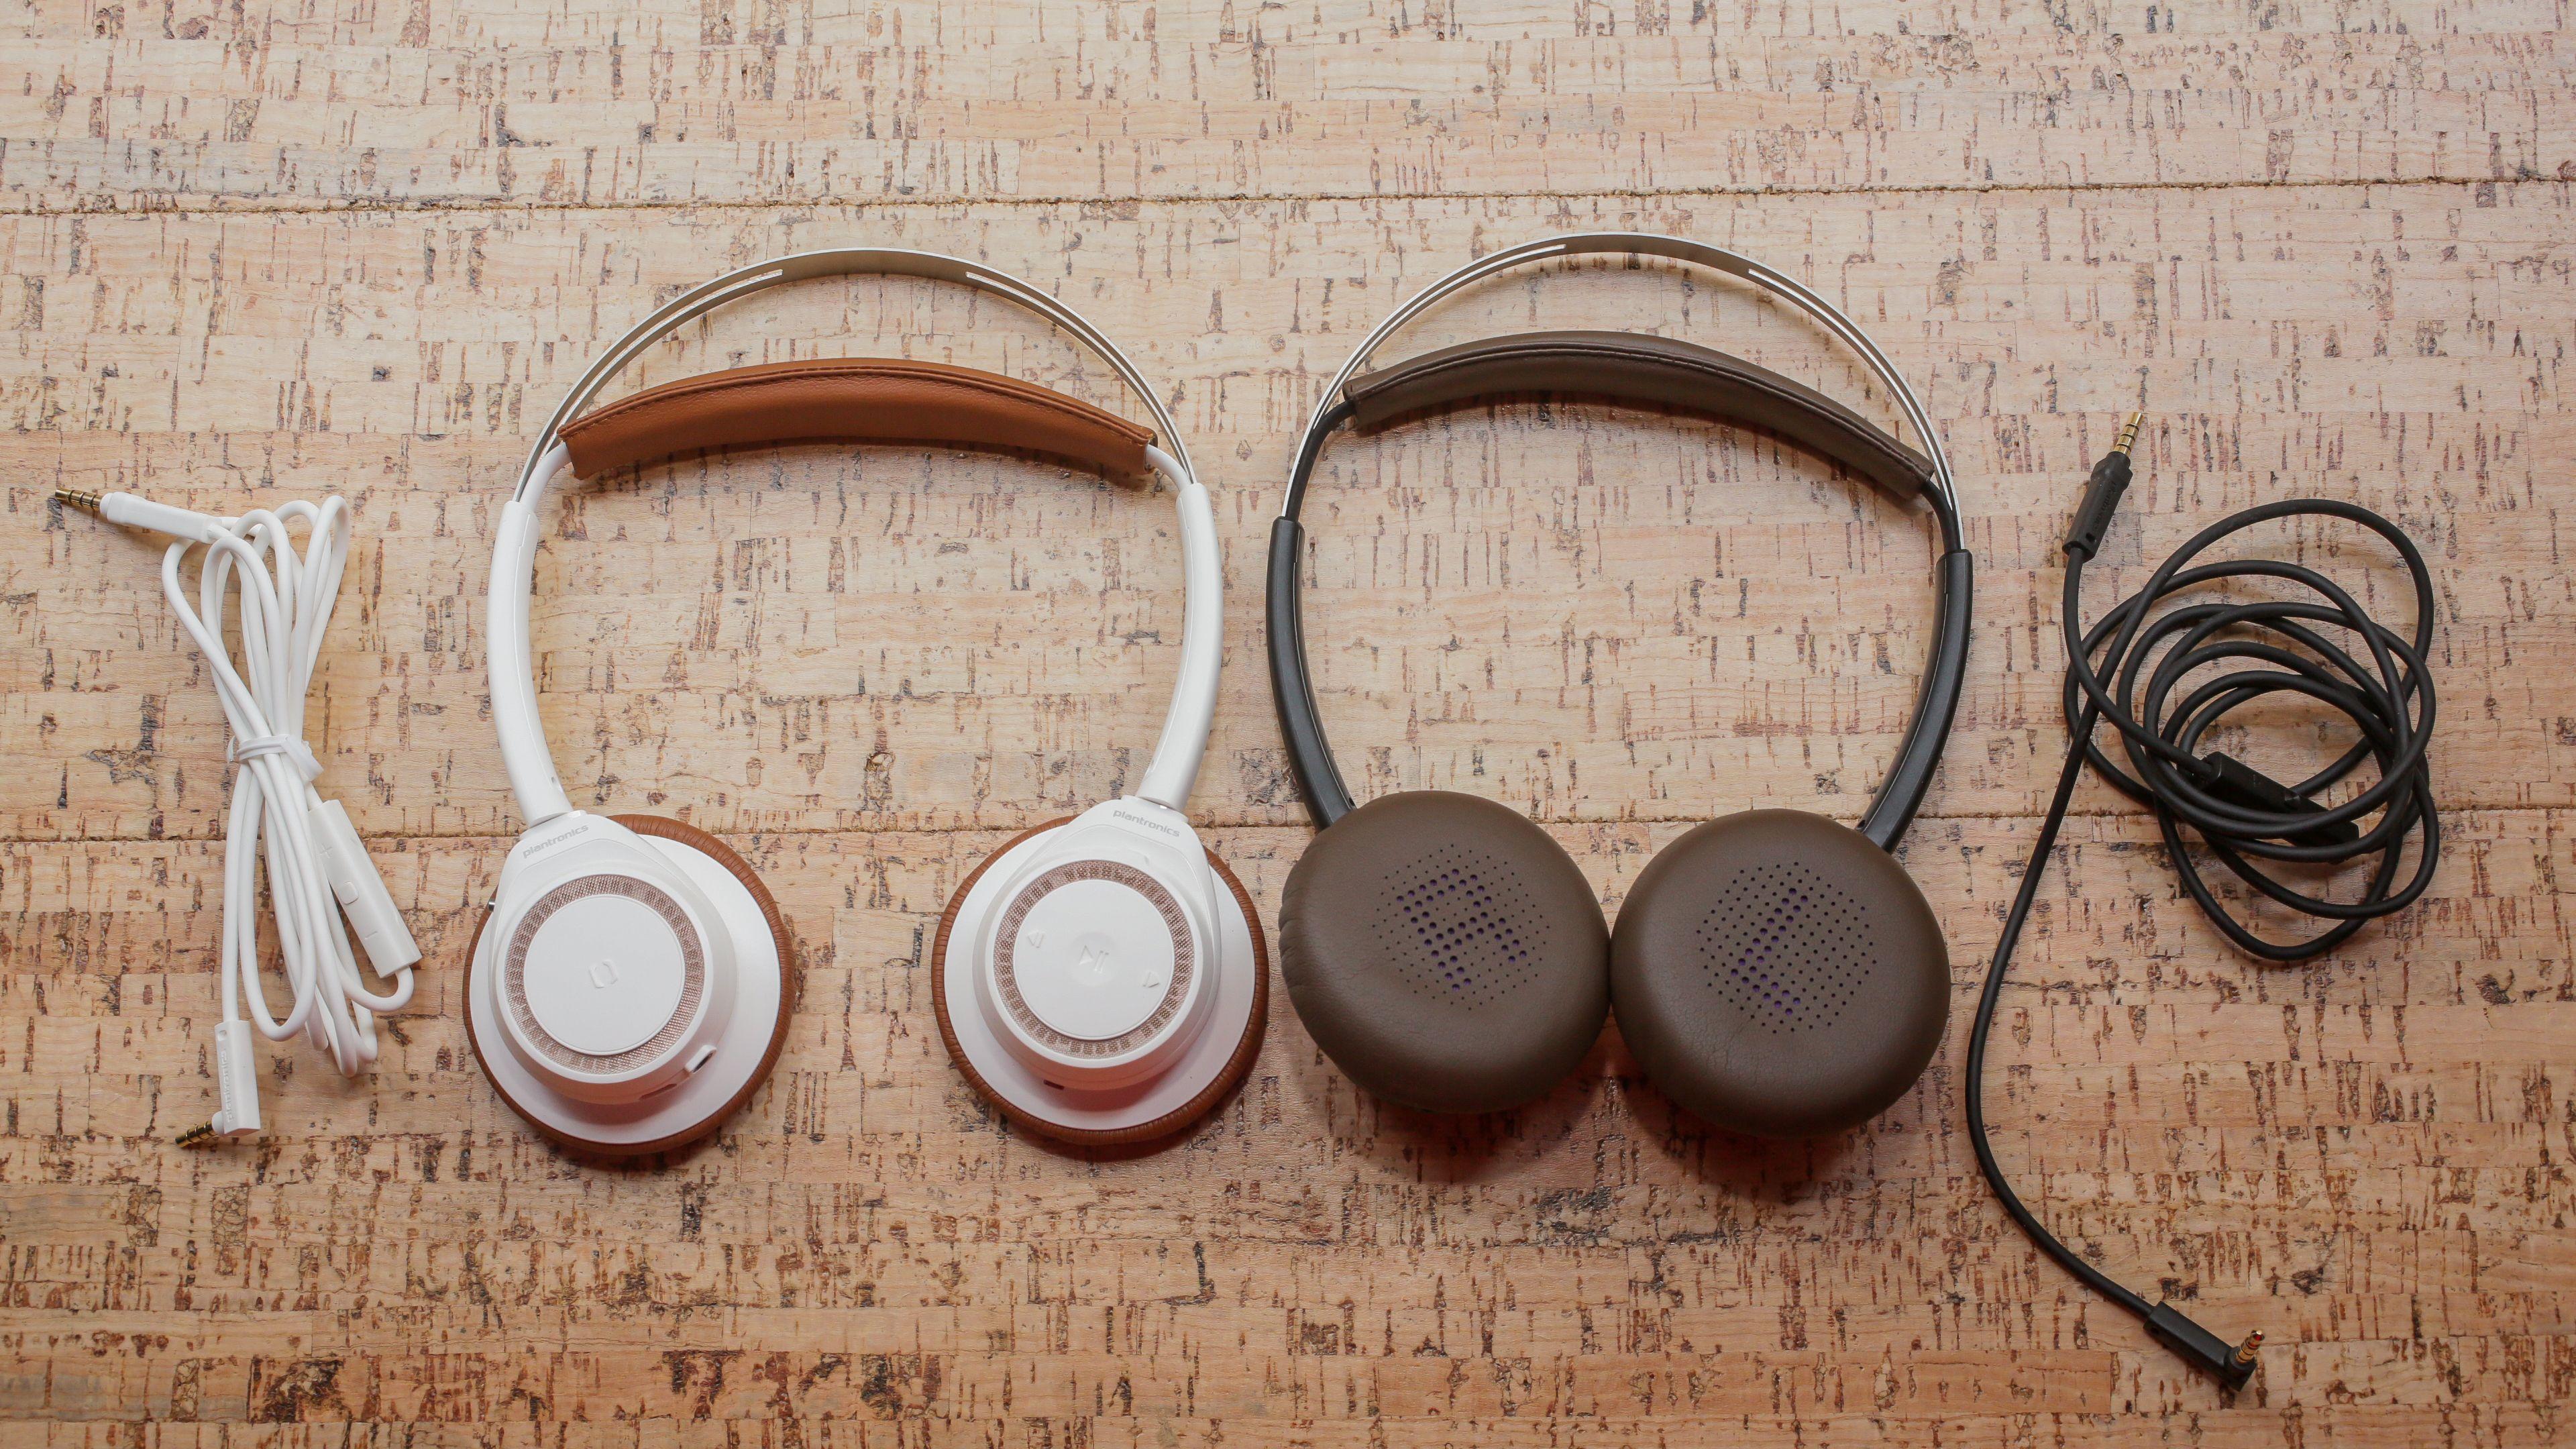 Plantronics Backbeat Sense With Images Bluetooth Headphones Wireless Headphones Best Headphones